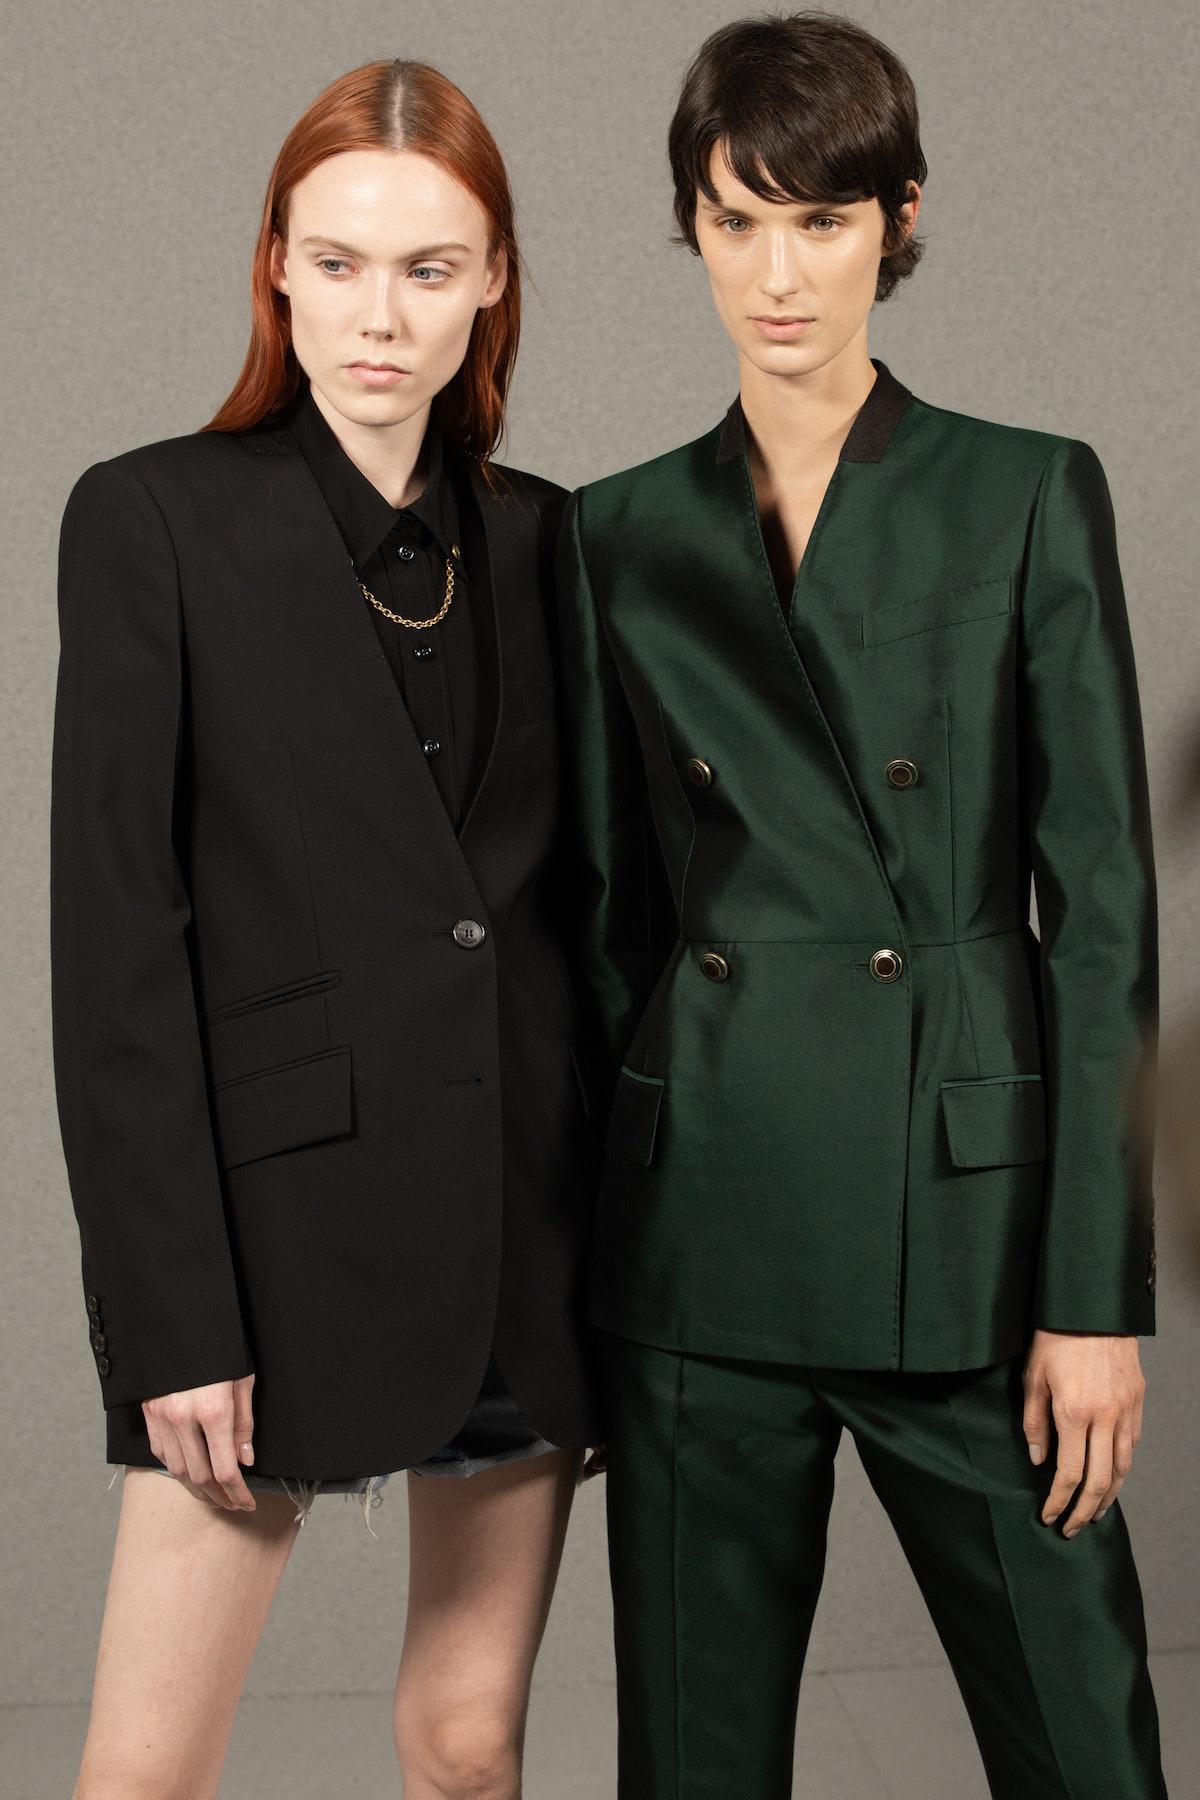 Serichai_Givenchy-085.jpg